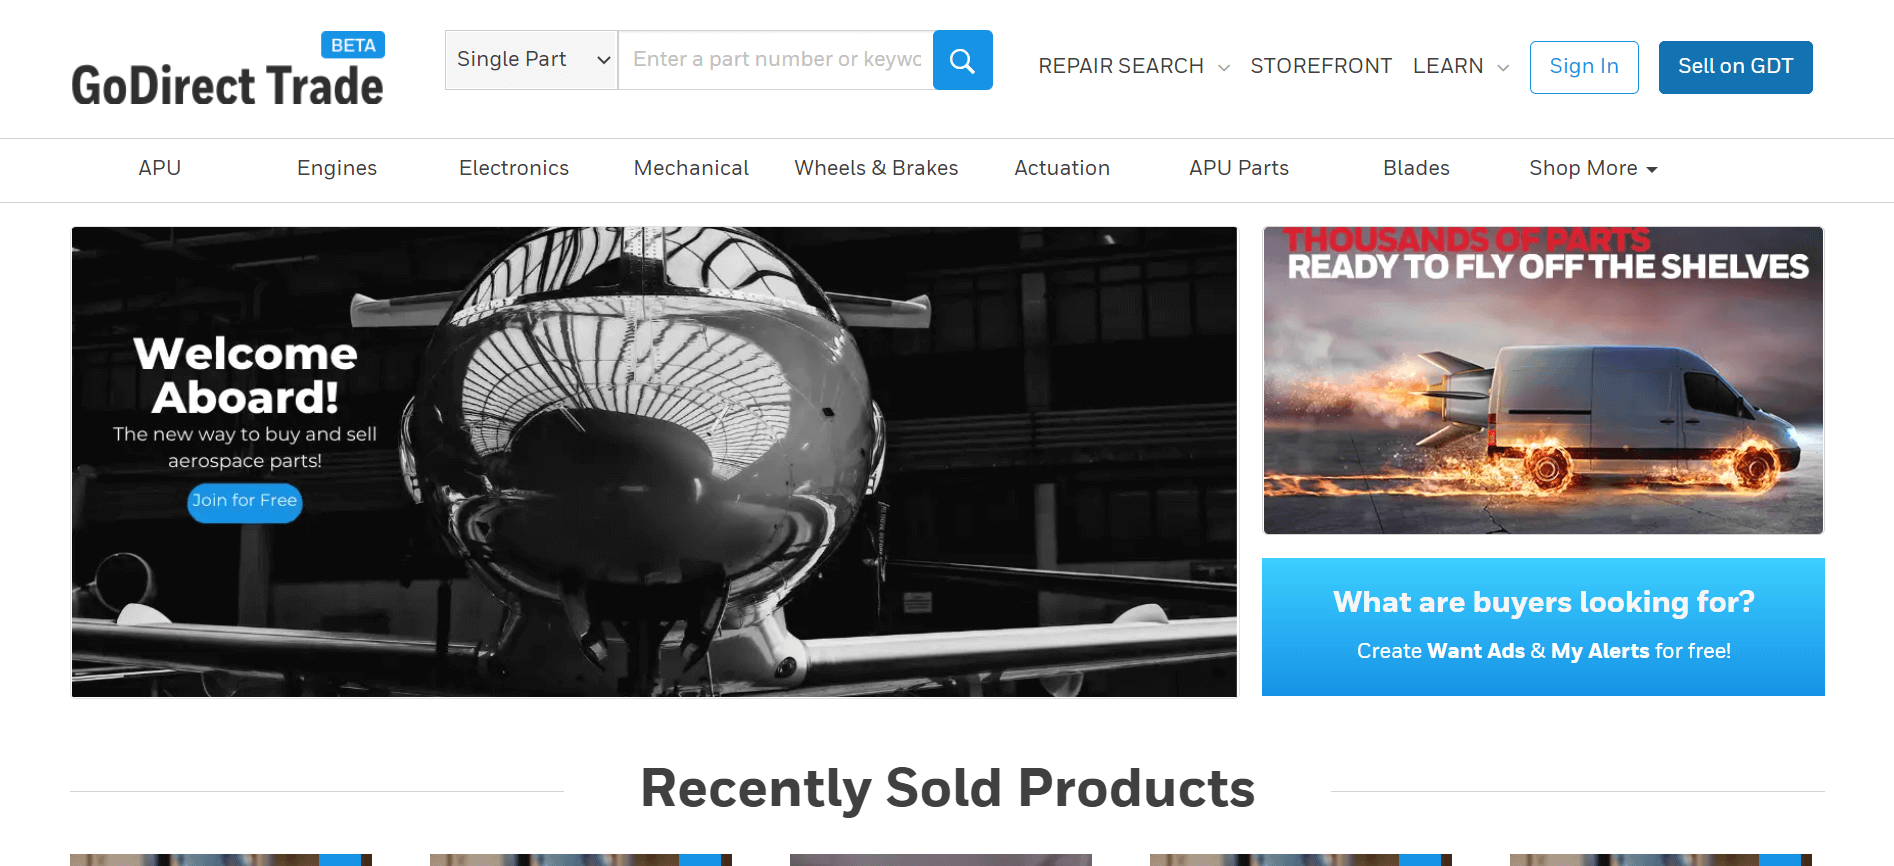 GoDirect Trade - HoneyWell